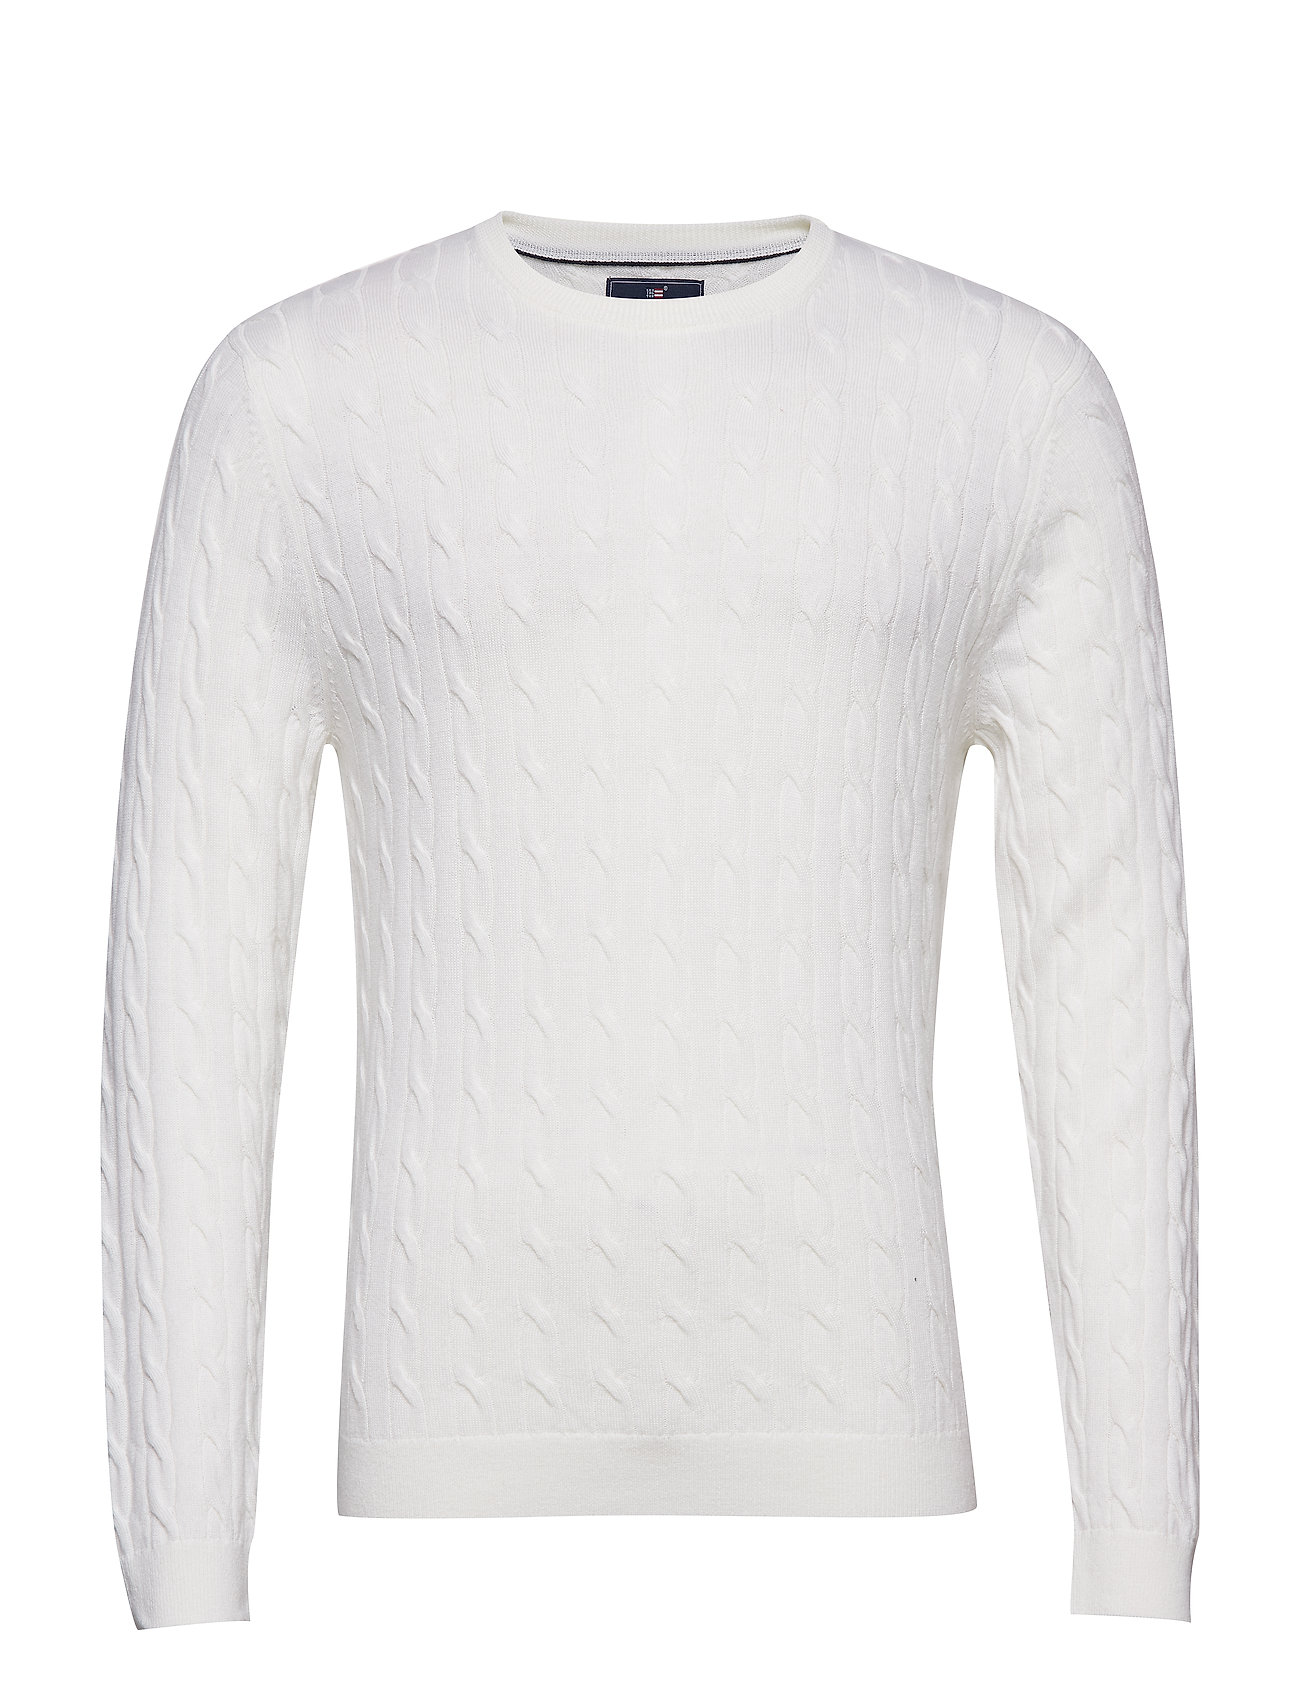 Cable Merino Clothing Sweatershell Dominic WhiteLexington shQCtrdx